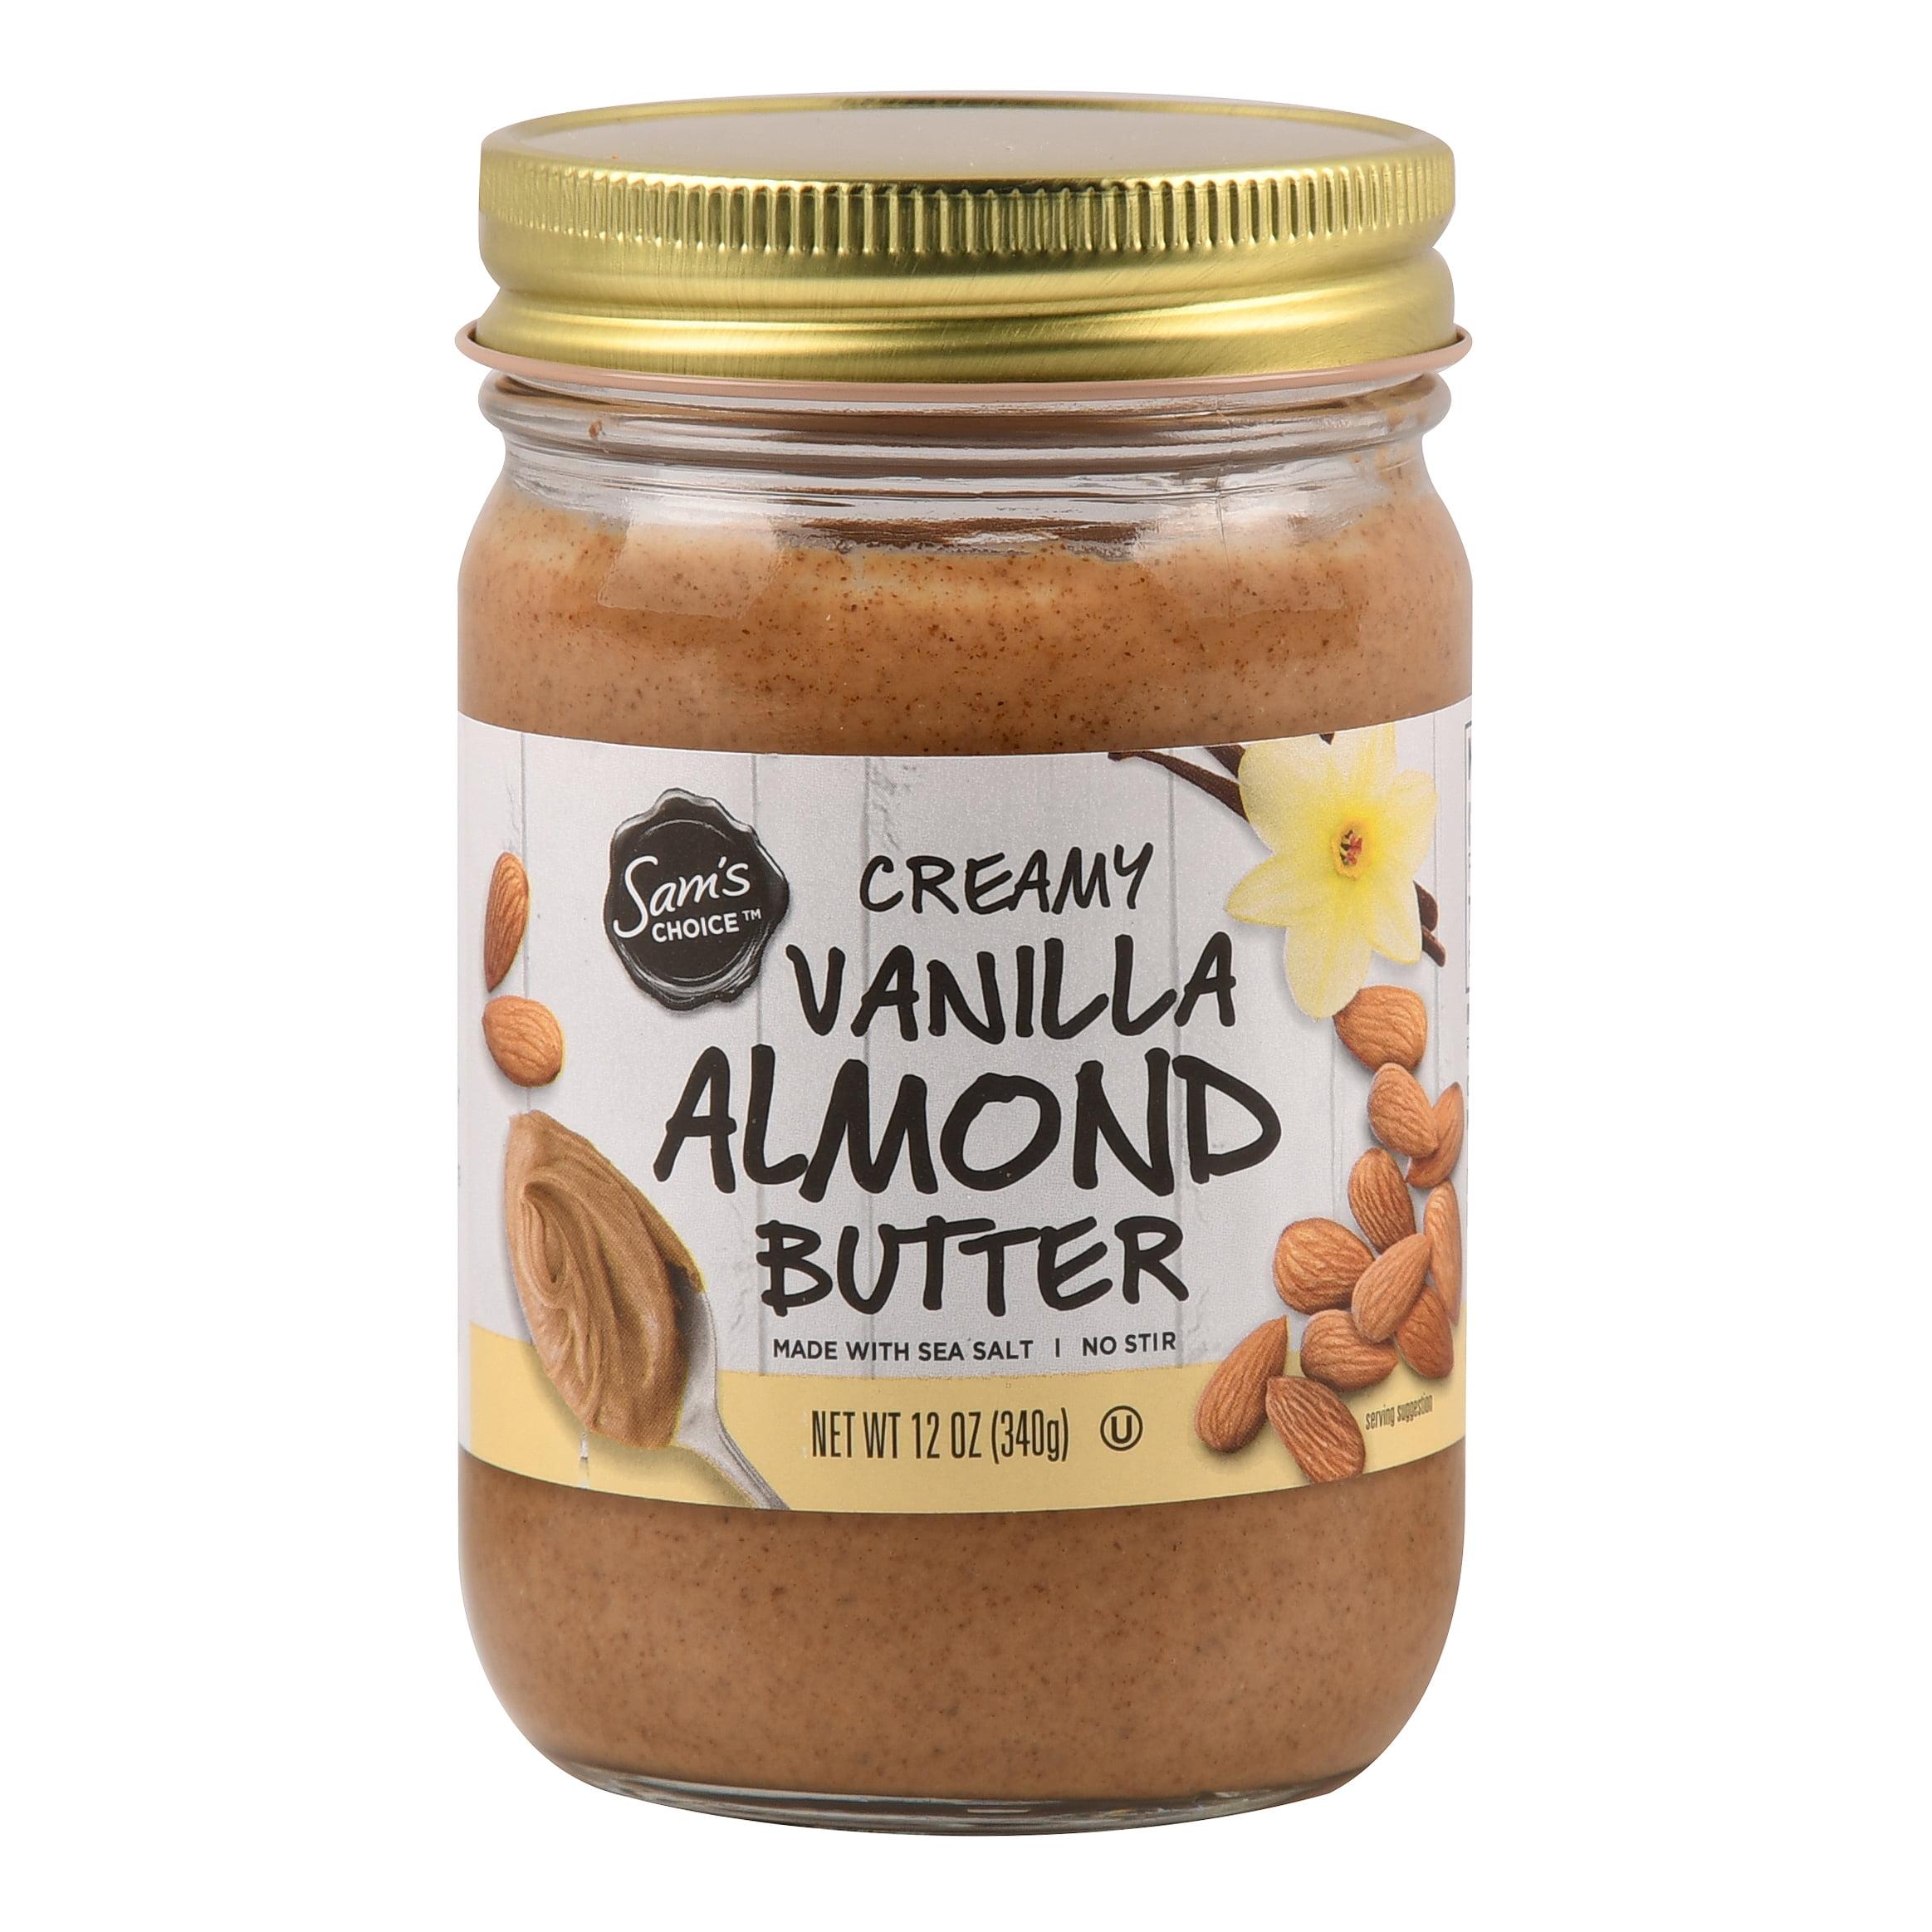 Sam's Choice Creamy Almond Butter, Vanilla, 12 oz